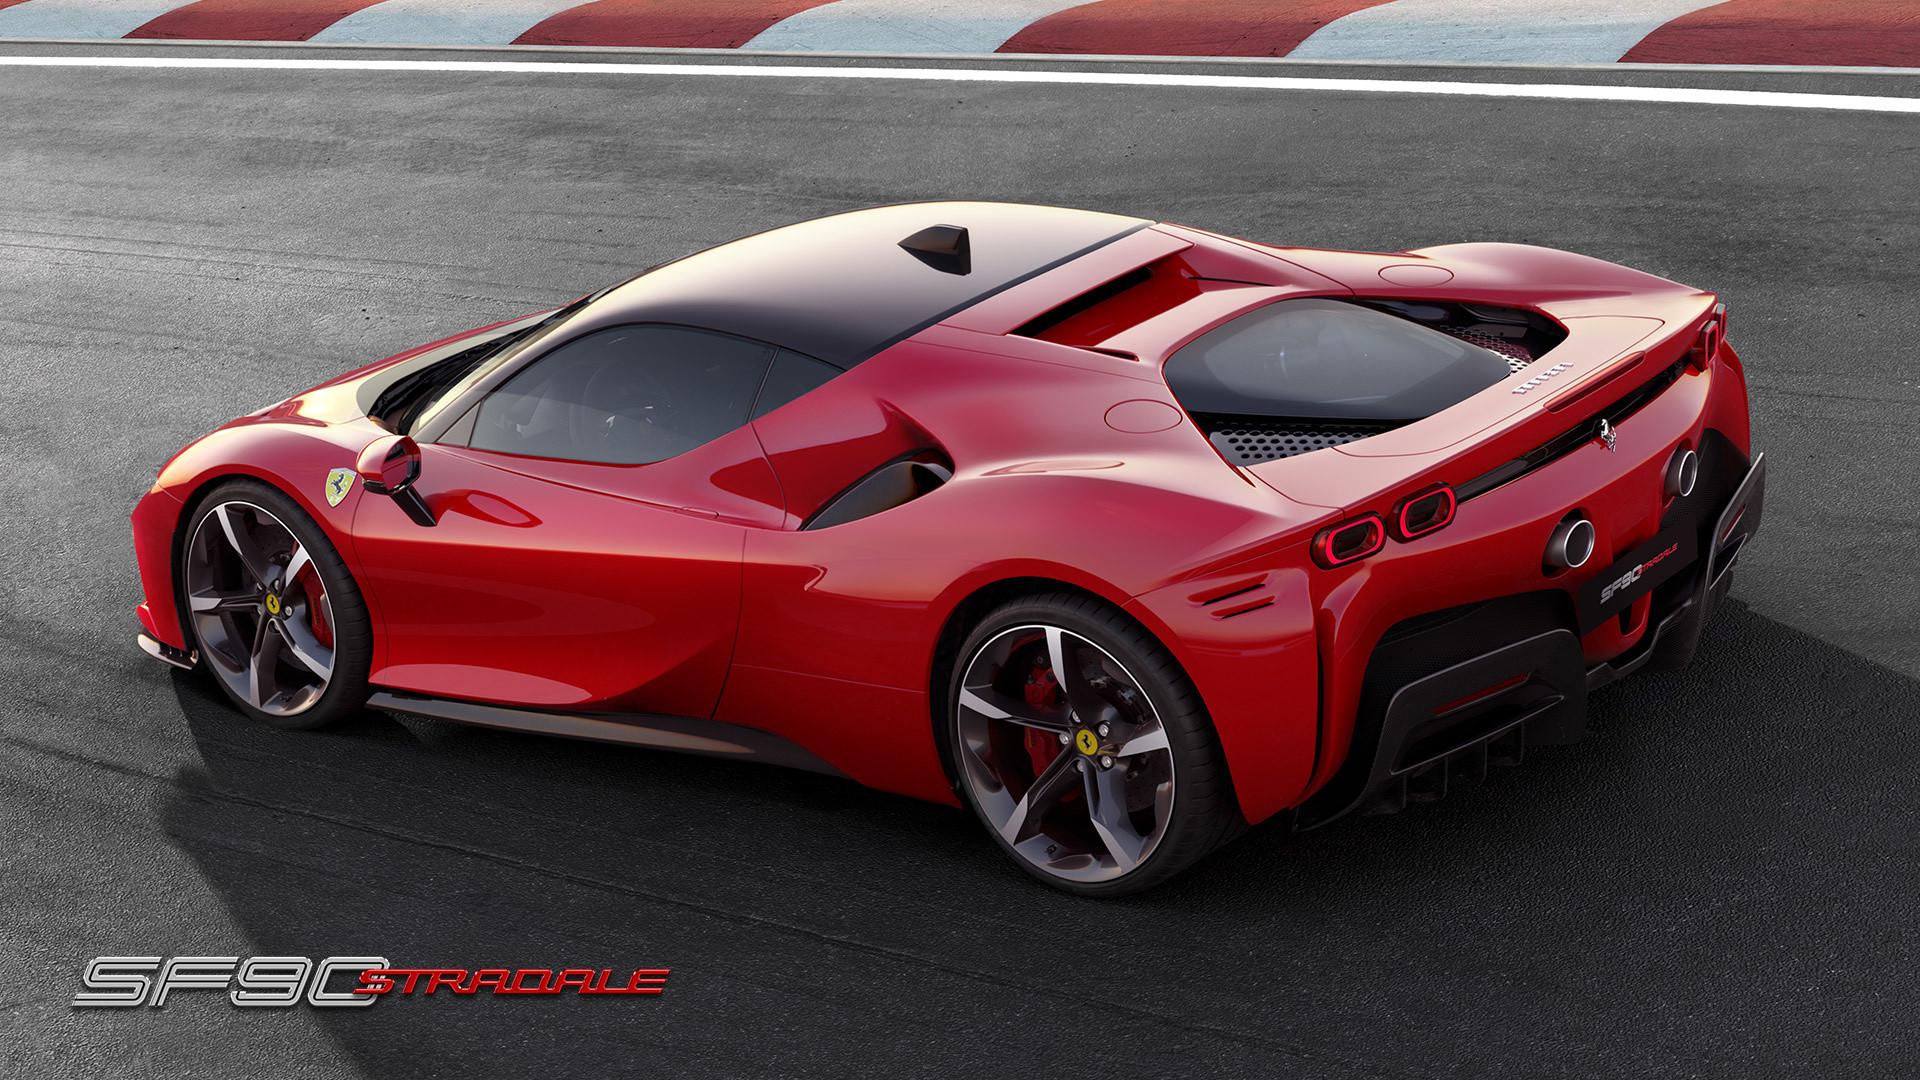 The New Ferrari Sf90 Stradale Uses Phev Design